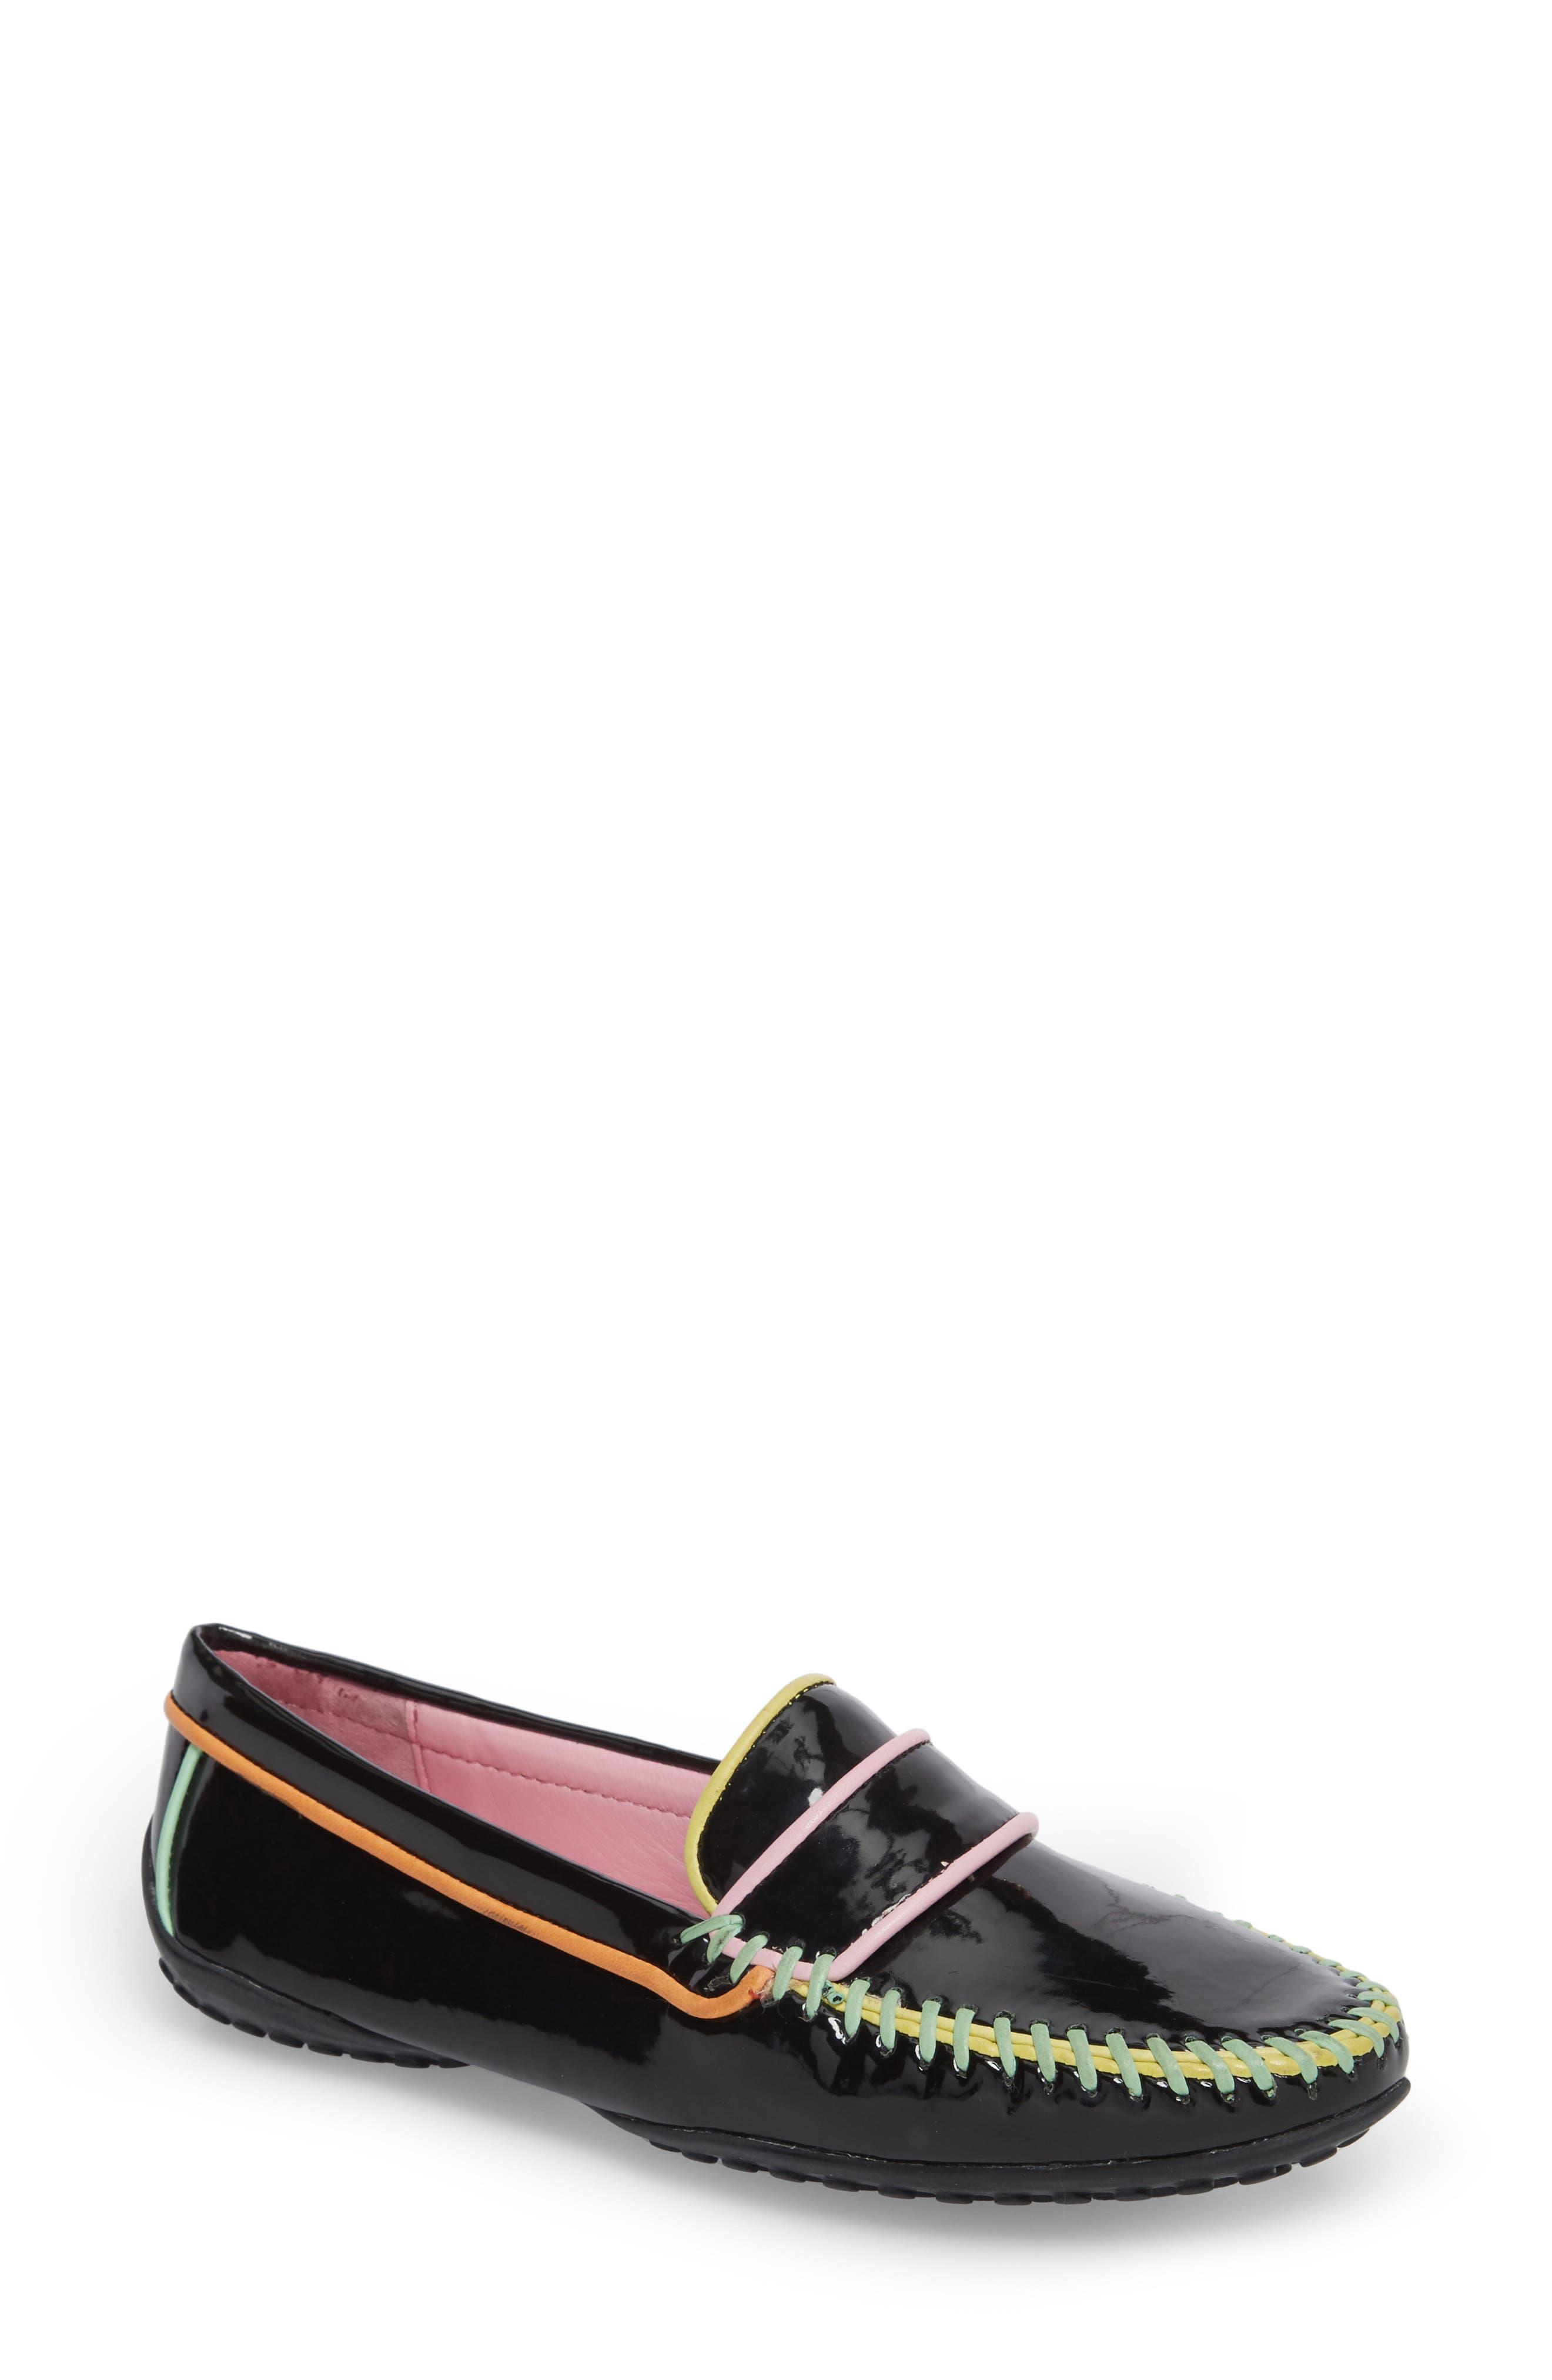 Moccasin Loafer,                         Main,                         color, 003